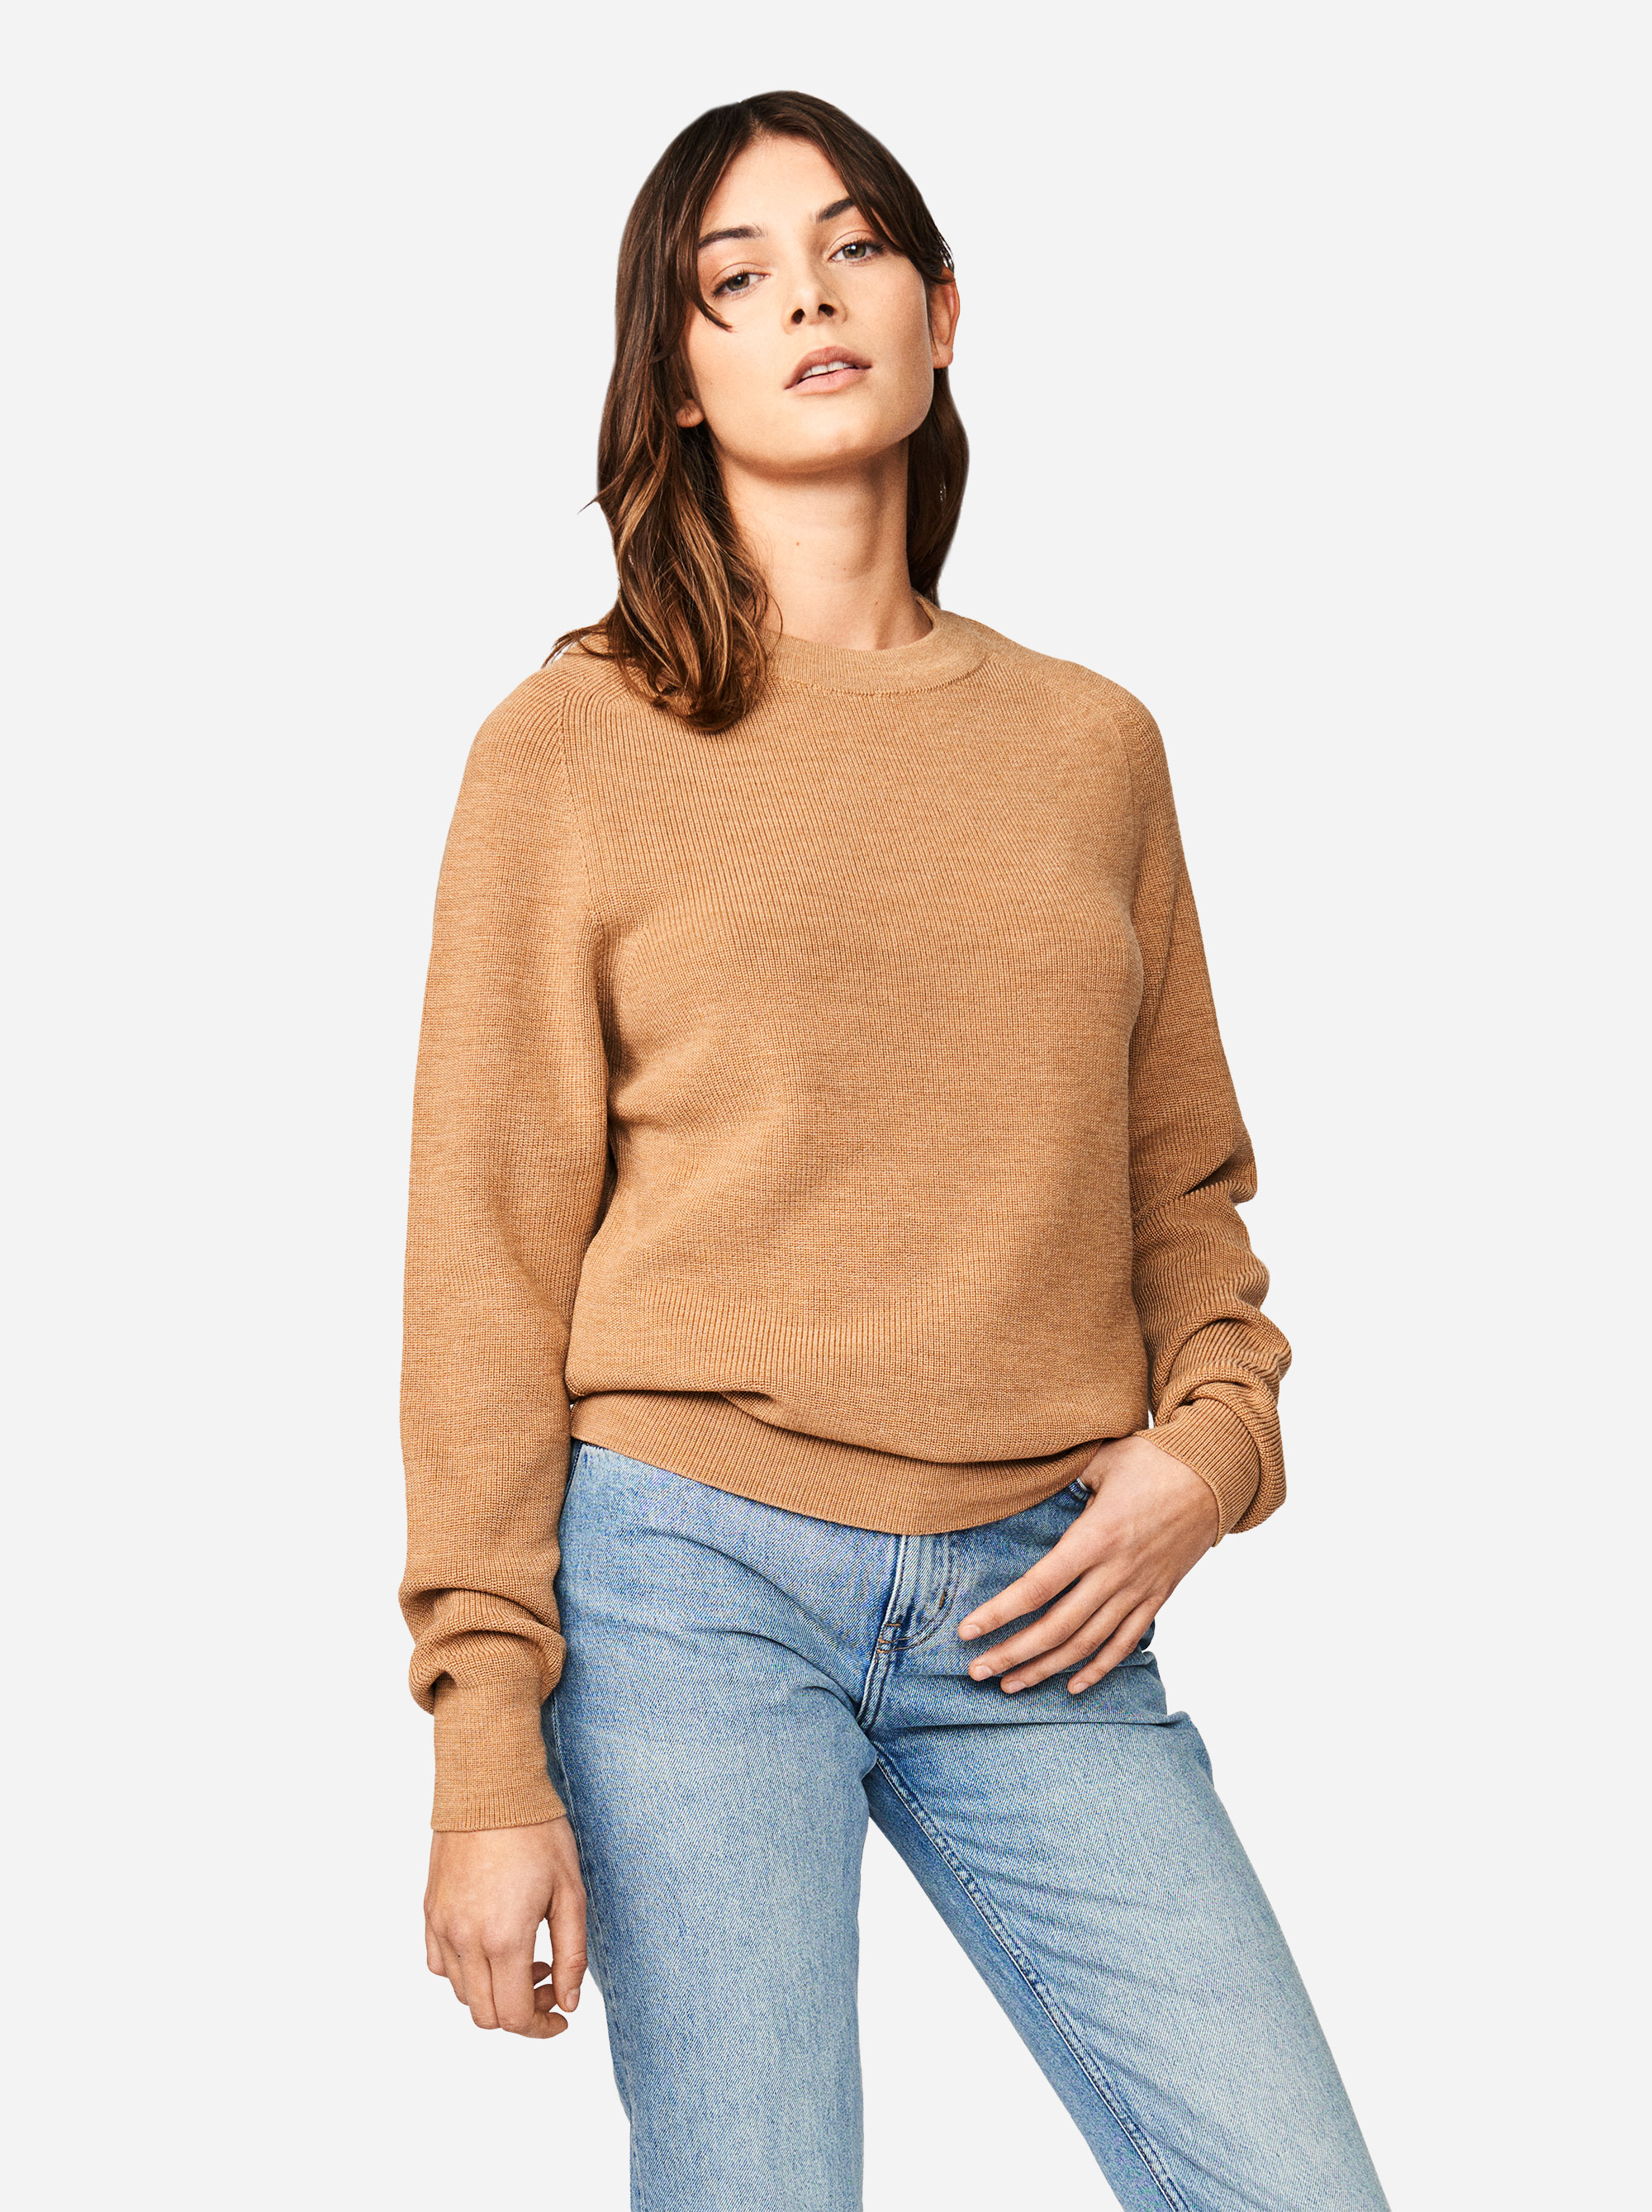 Teym - Crewneck - The Merino Sweater - Women - Camel - 3